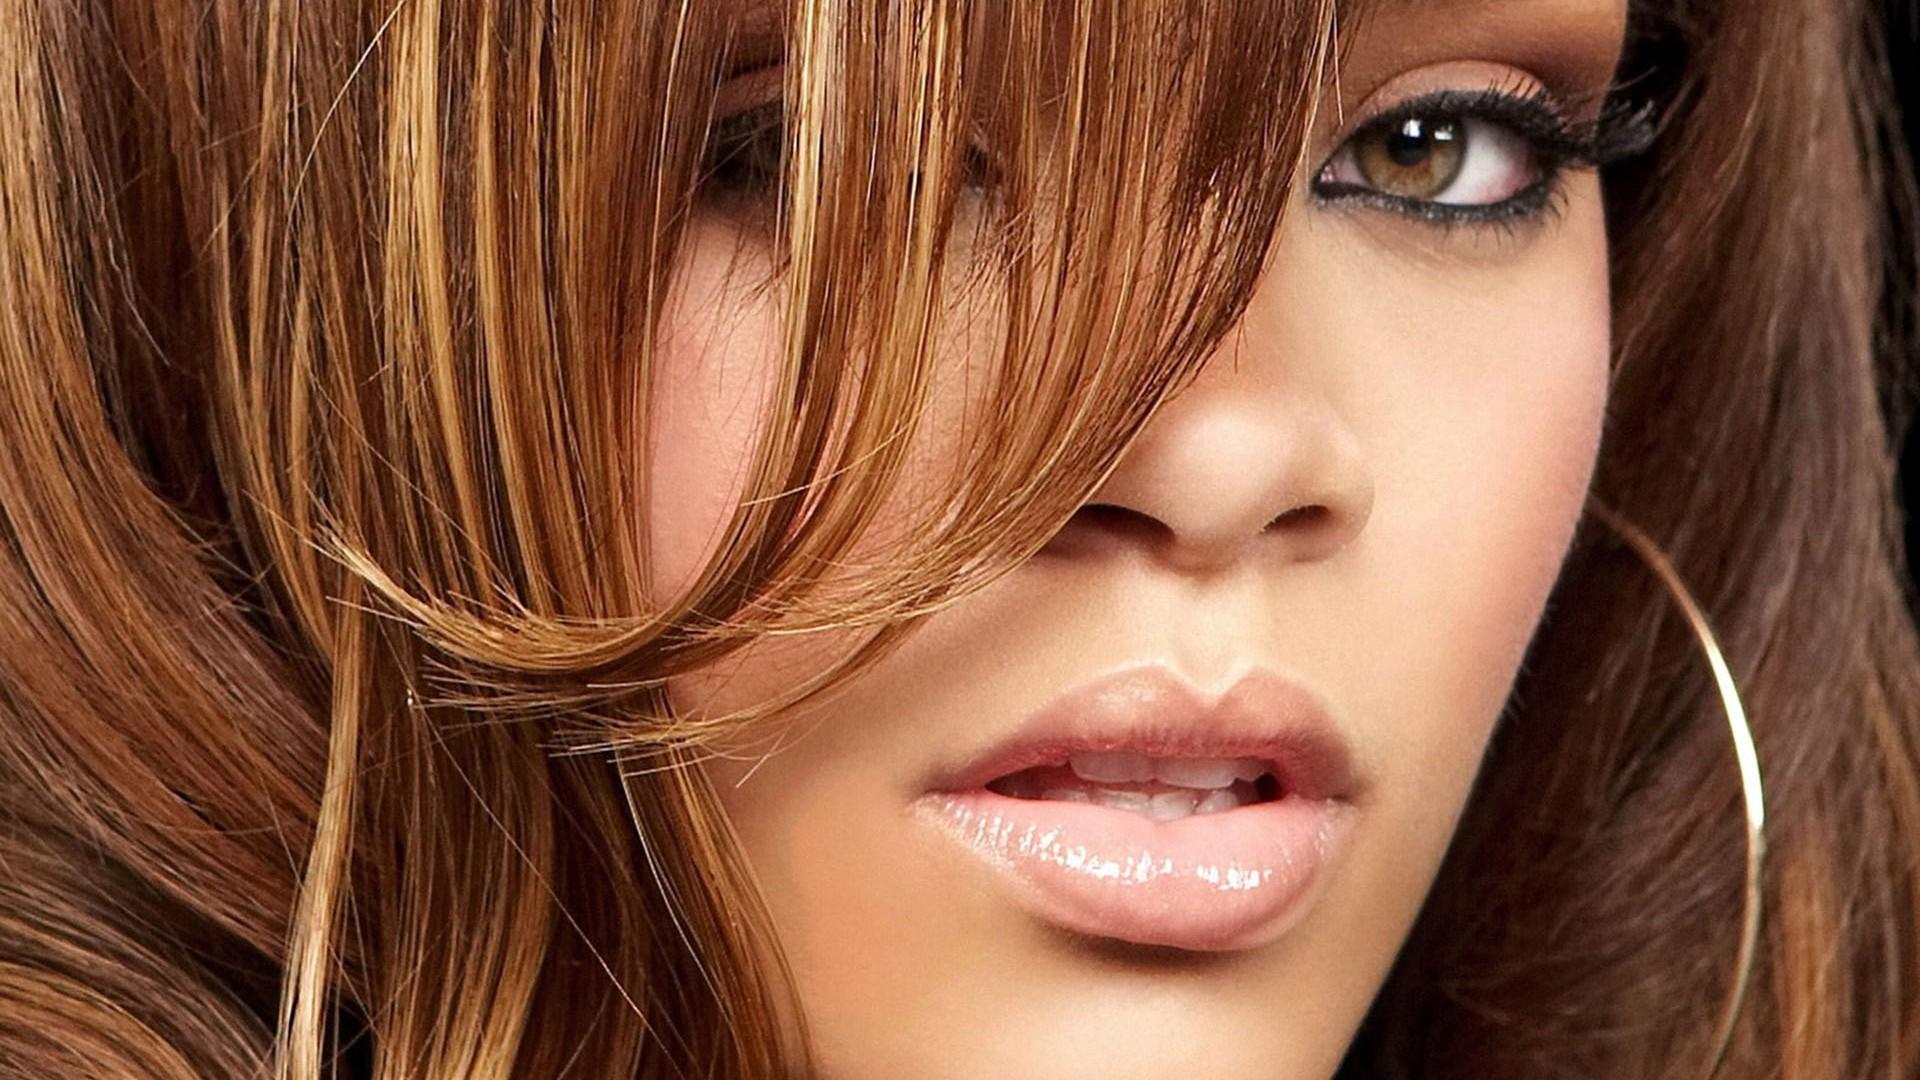 Beautiful Rihanna Wallpaper HD 1920x1080 ImageBankbiz 1920x1080